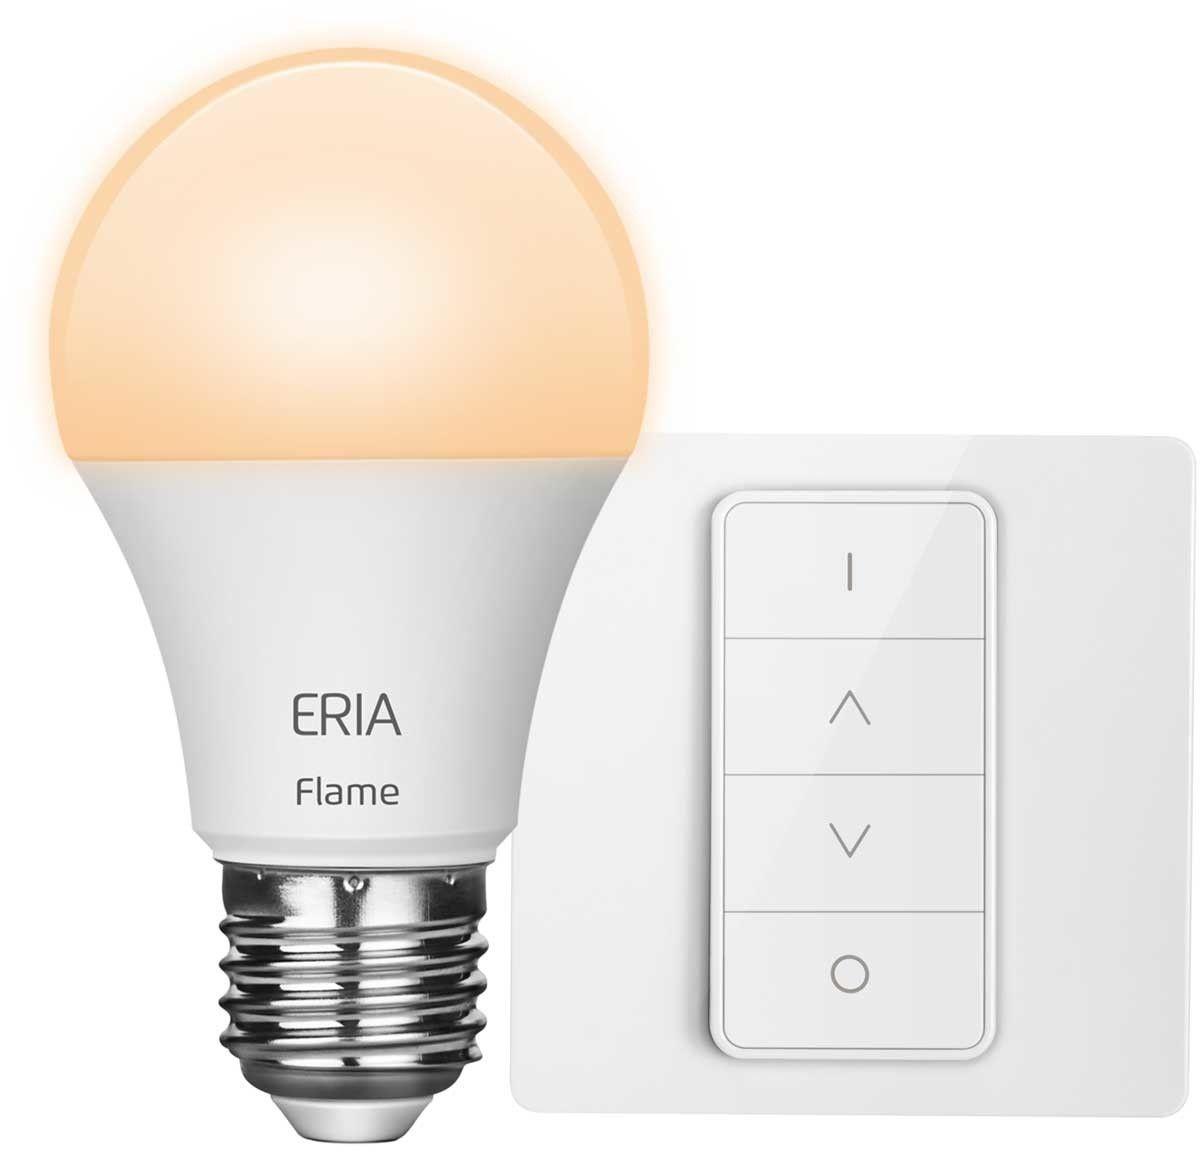 AduroSmart Wireless Dimming Kit Flame Light